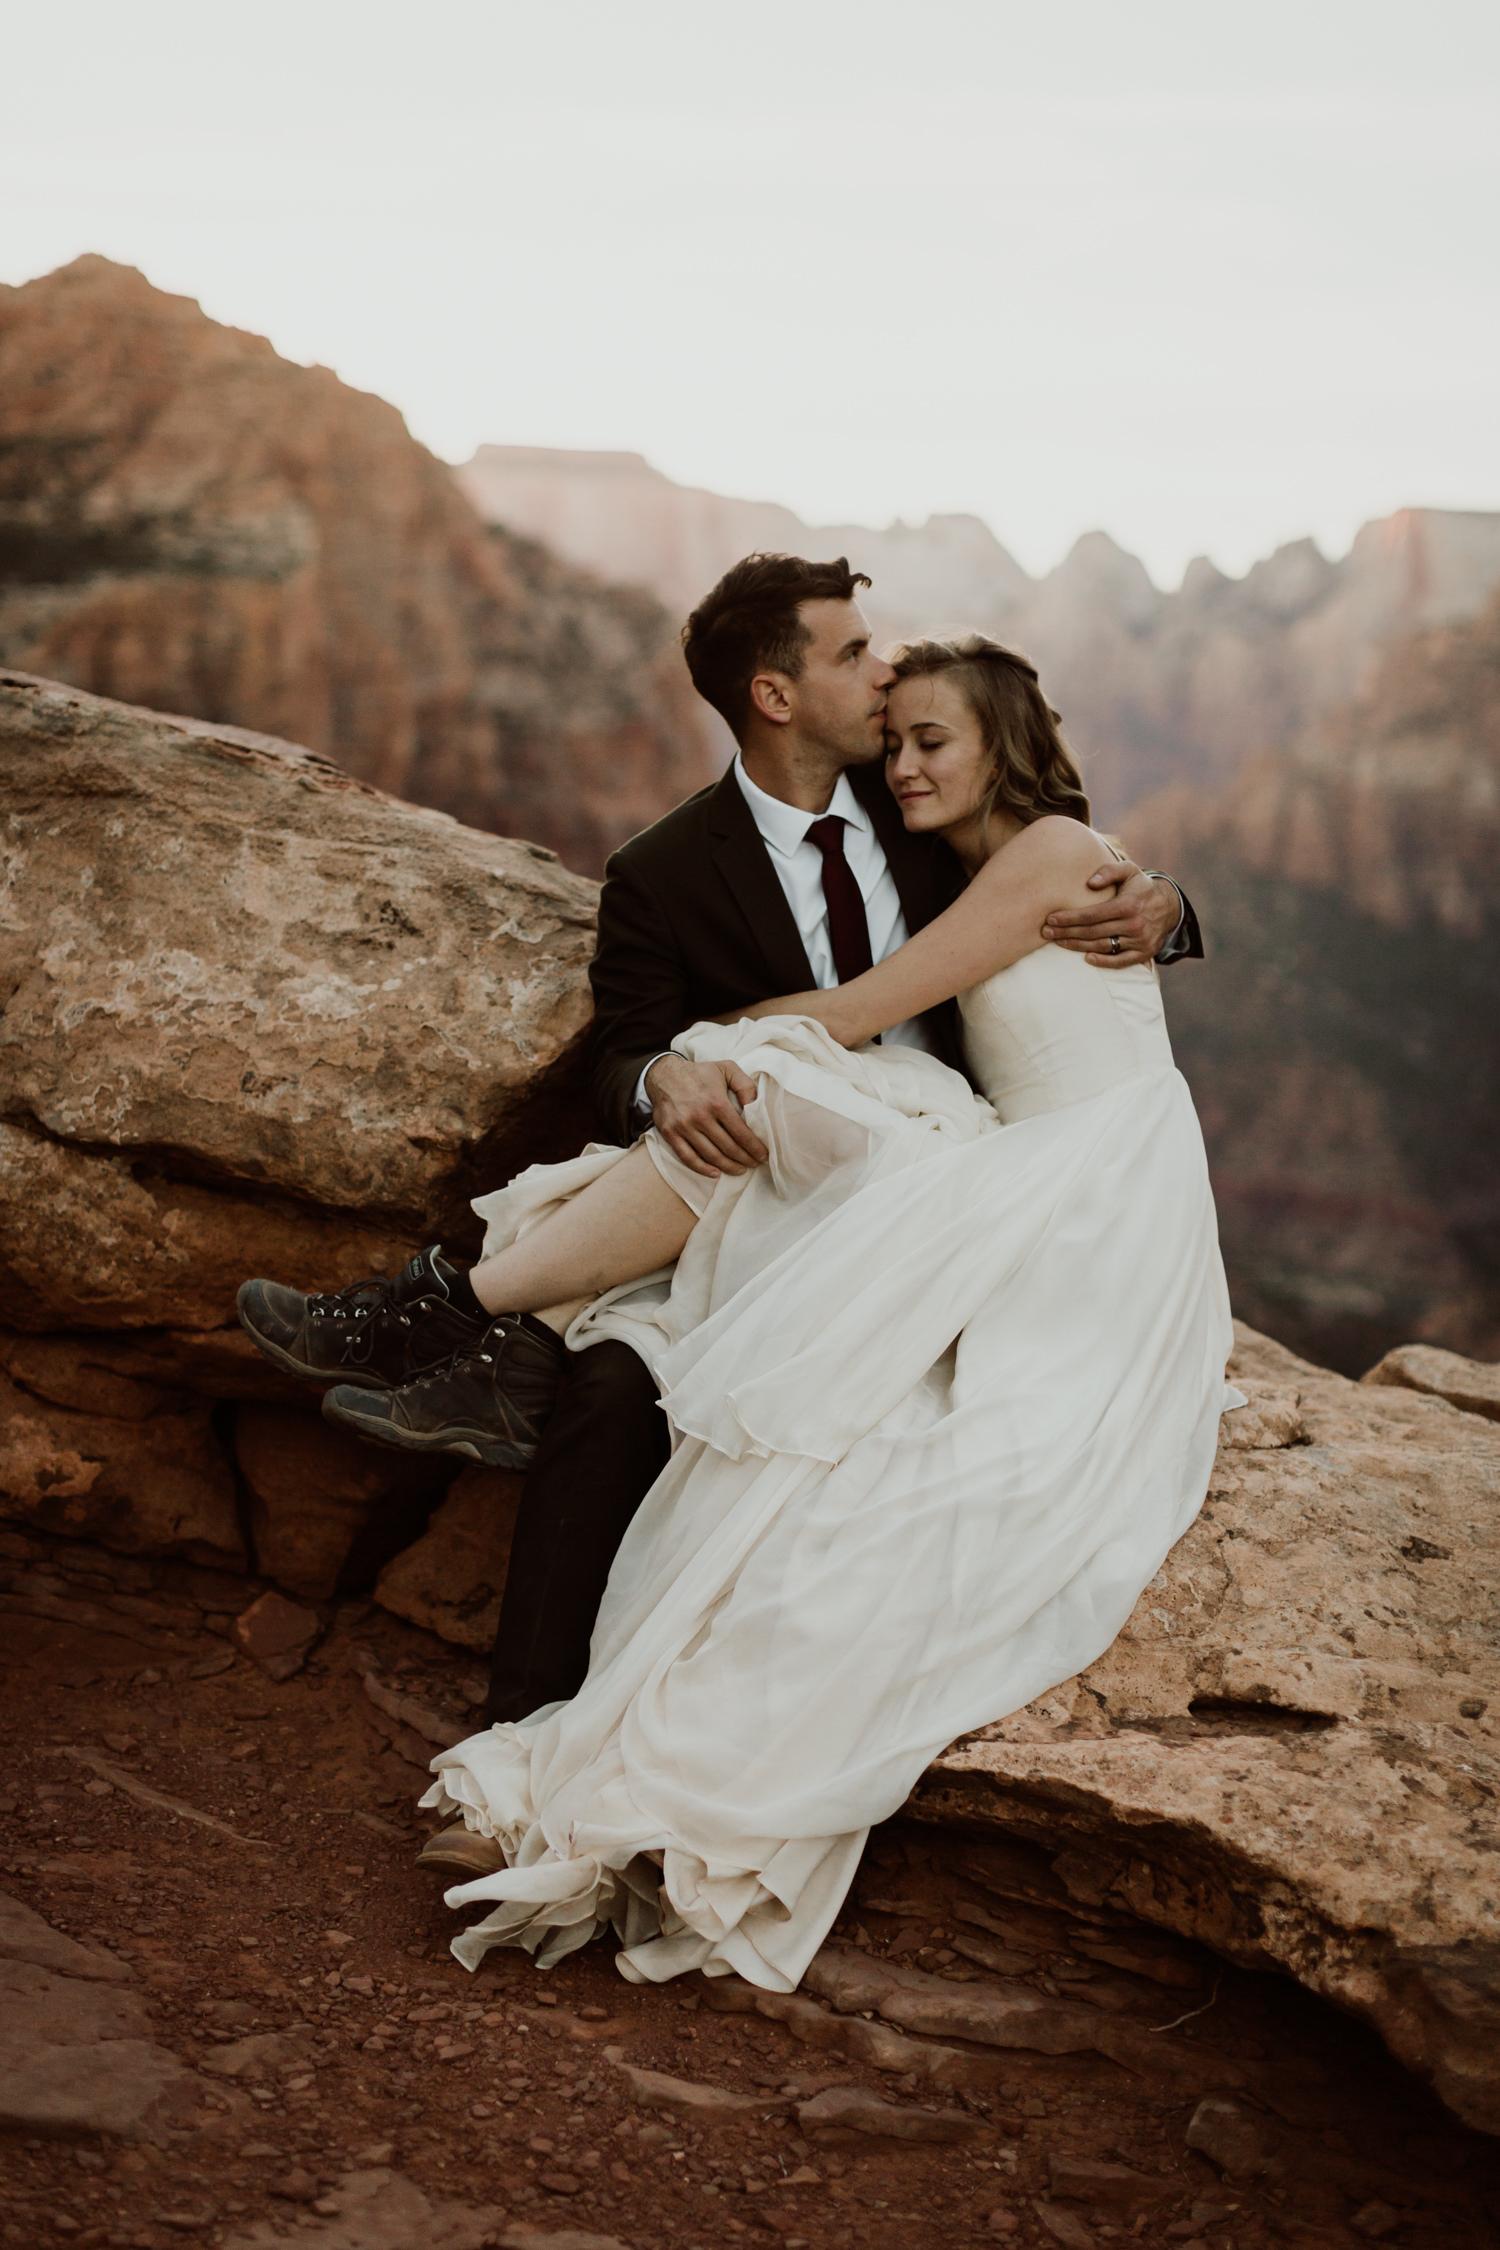 zion-national-park-wedding-123.jpg